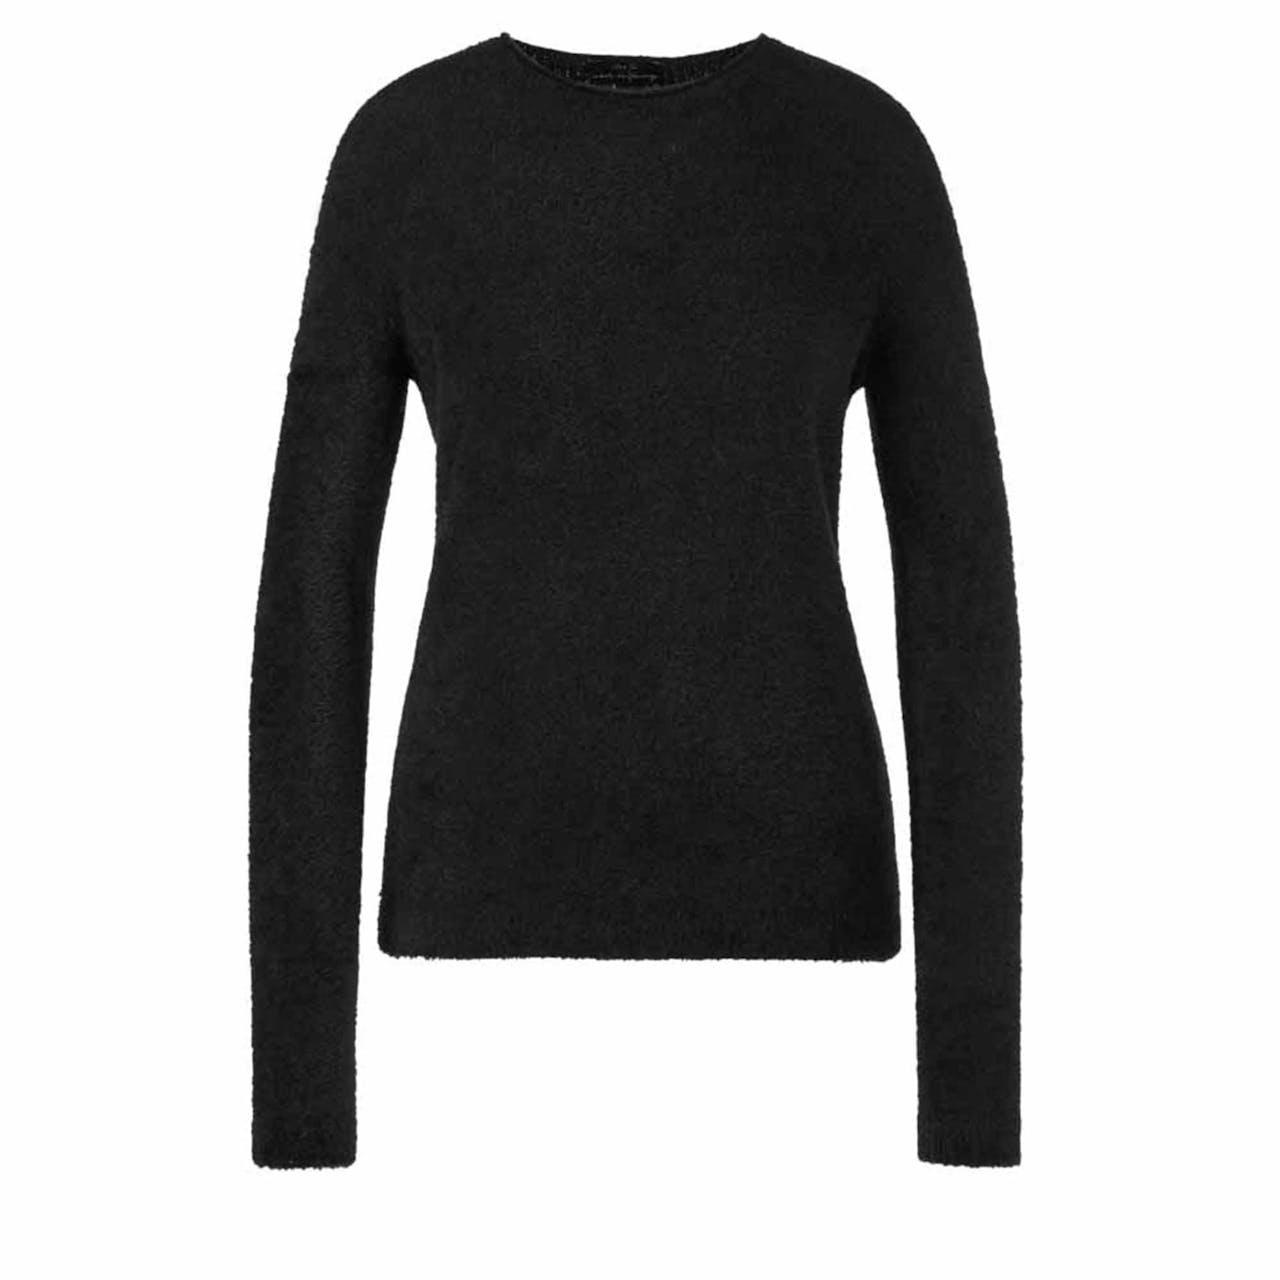 Pullover - Slim Fit - Crewneck